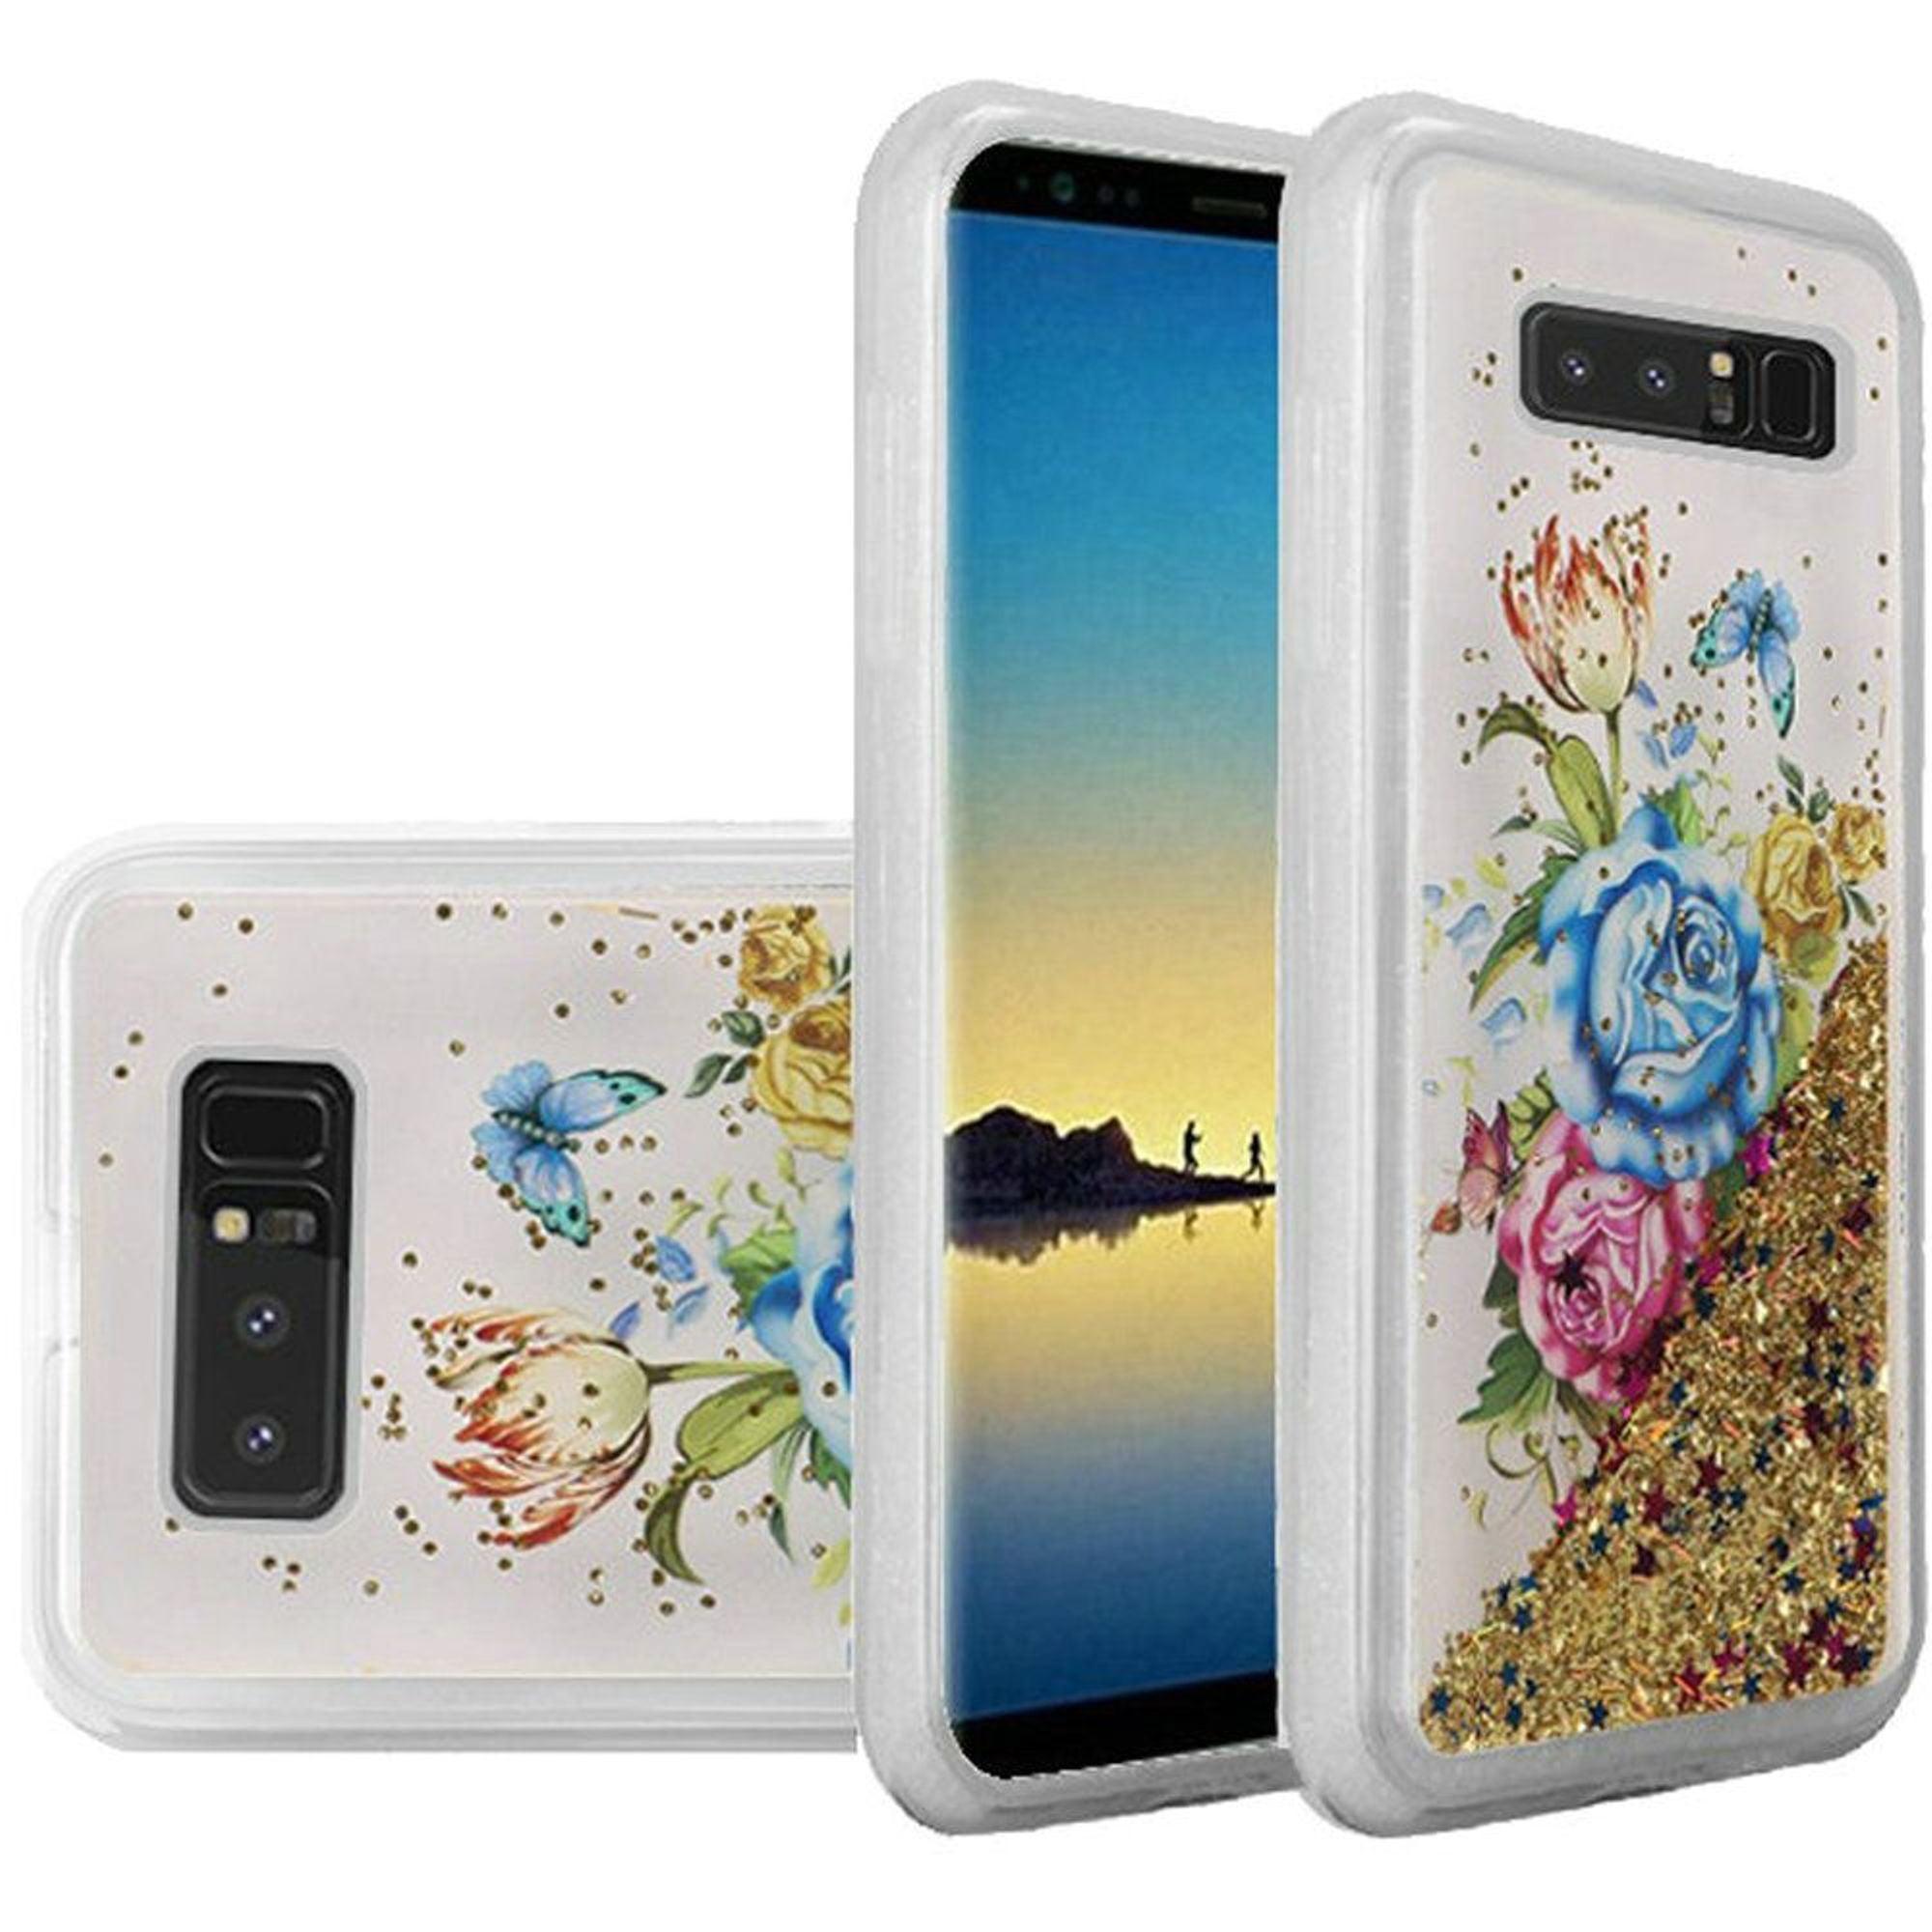 Samsung Galaxy Note 8 case by Insten Luxury Quicksand Glitter Liquid Floating Sparkle Bling Fashion Phone Case Cover for Samsung Galaxy Note 8